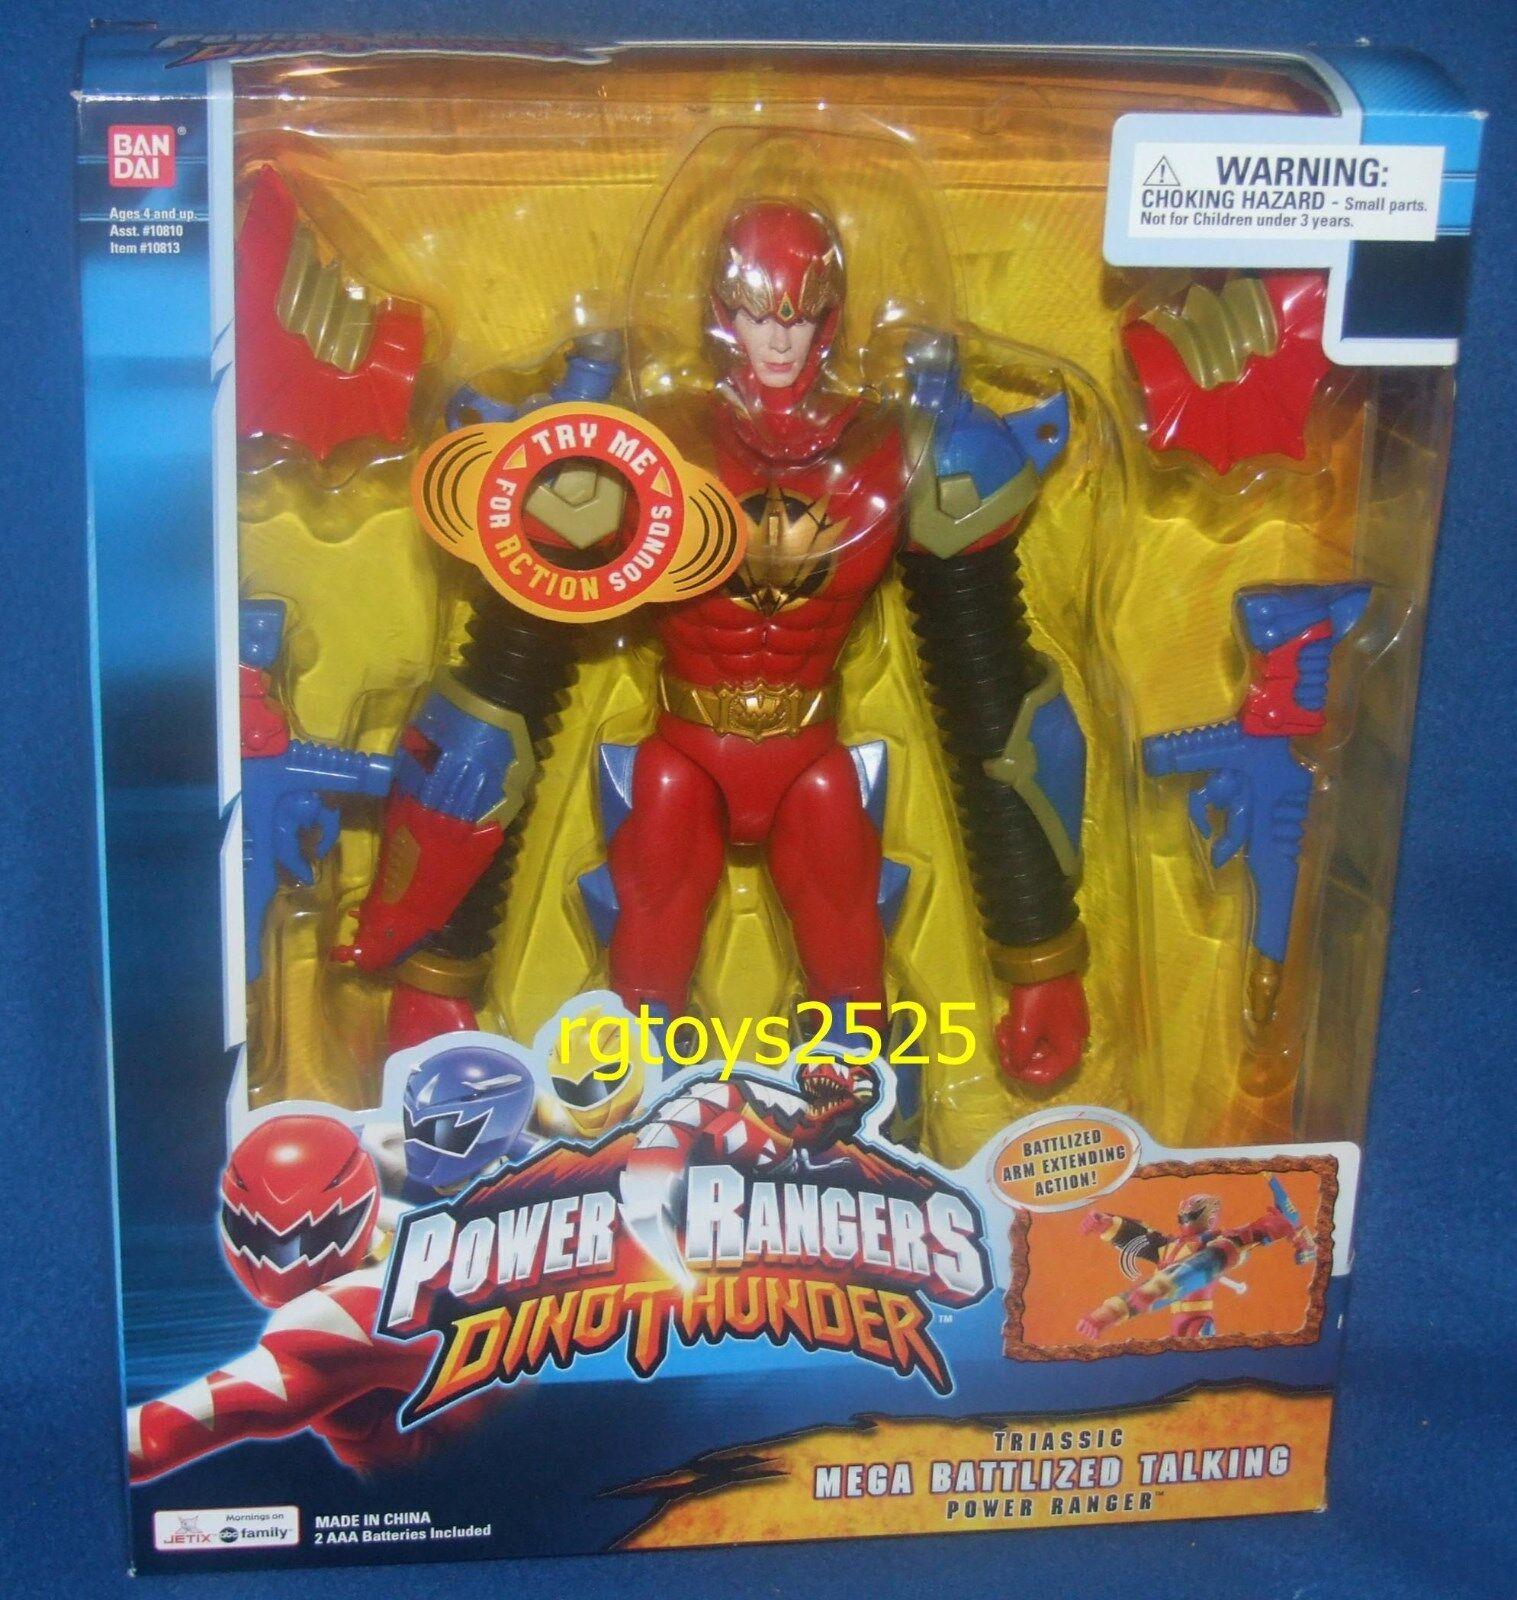 Power Rangers Dino Thunder TRIASSIC 12